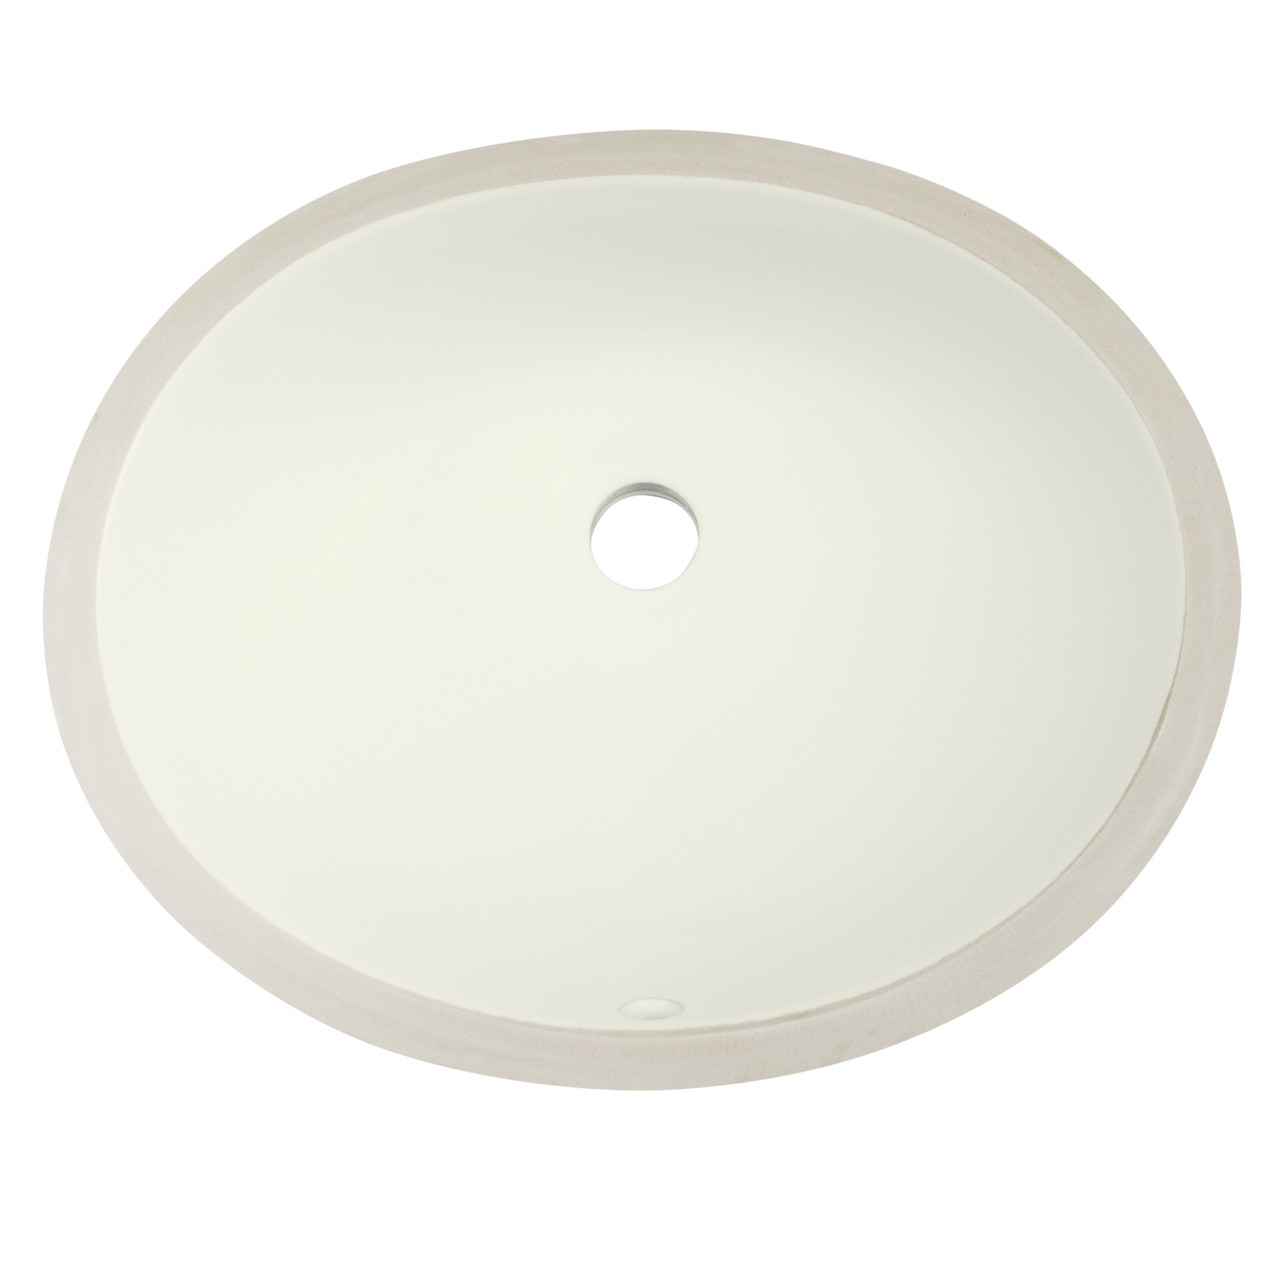 Beli  Klasik Oval Basin Keramik Undermount Simple kesombongan Sink,Klasik Oval Basin Keramik Undermount Simple kesombongan Sink Harga,Klasik Oval Basin Keramik Undermount Simple kesombongan Sink Merek,Klasik Oval Basin Keramik Undermount Simple kesombongan Sink Produsen,Klasik Oval Basin Keramik Undermount Simple kesombongan Sink Quotes,Klasik Oval Basin Keramik Undermount Simple kesombongan Sink Perusahaan,